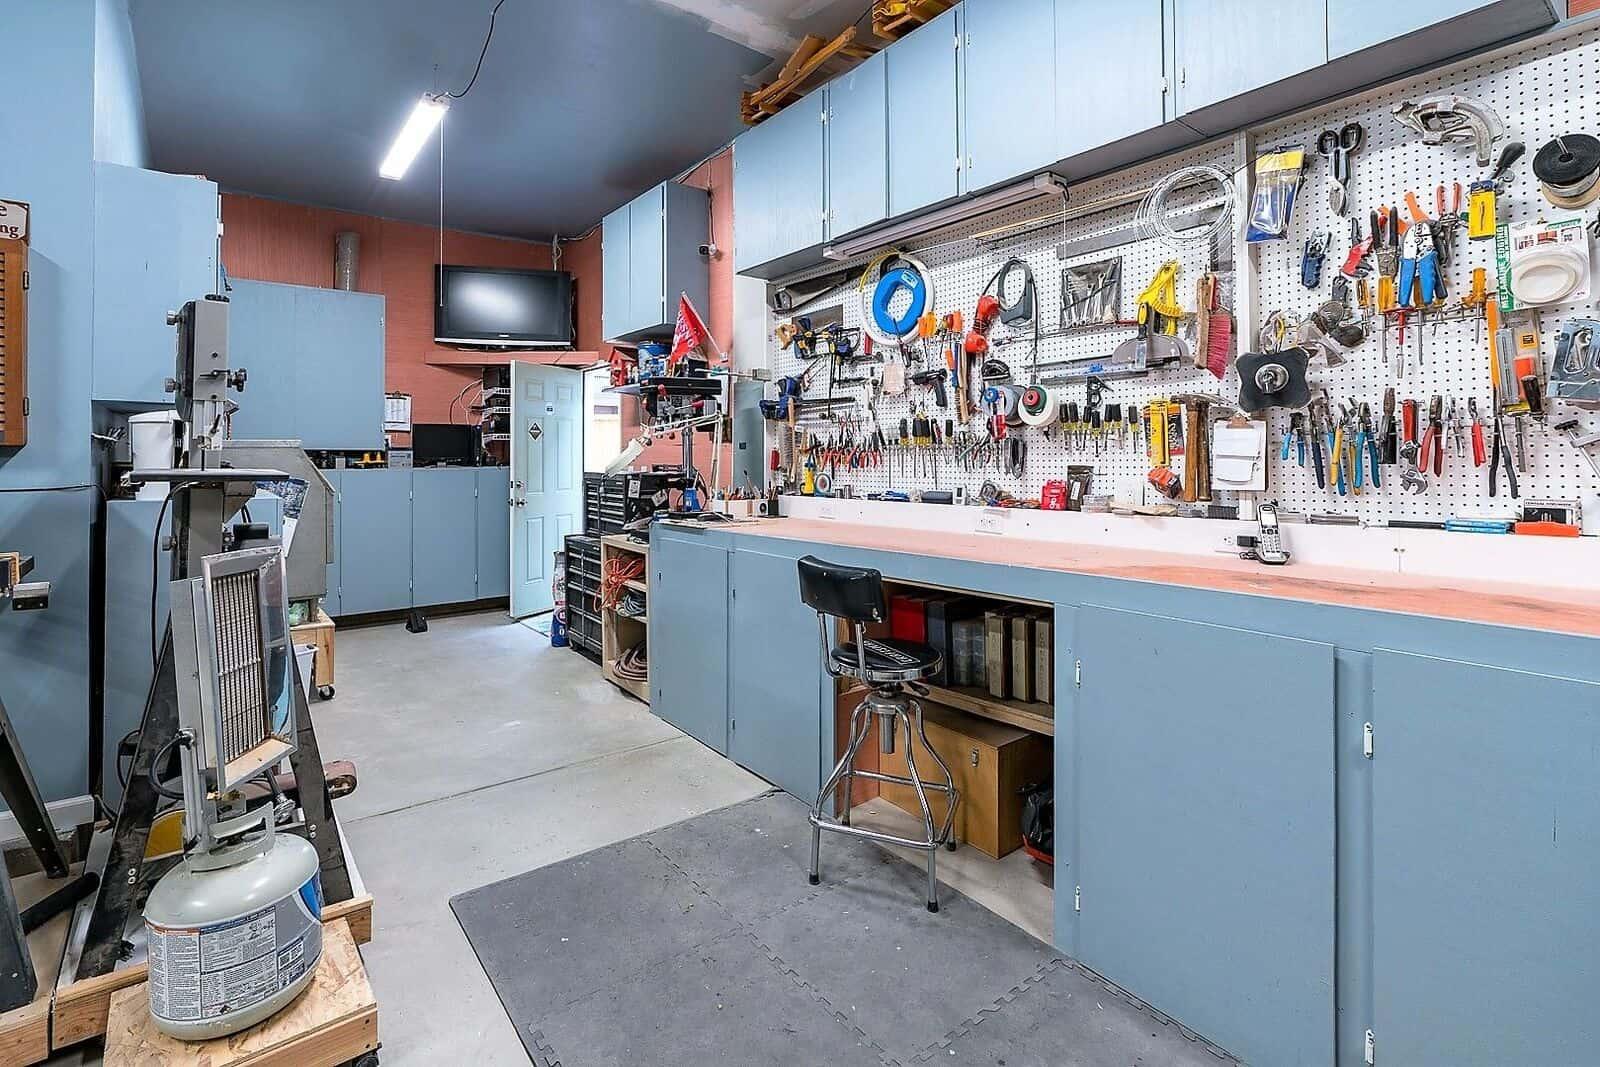 Extra Garage Space for Workshop